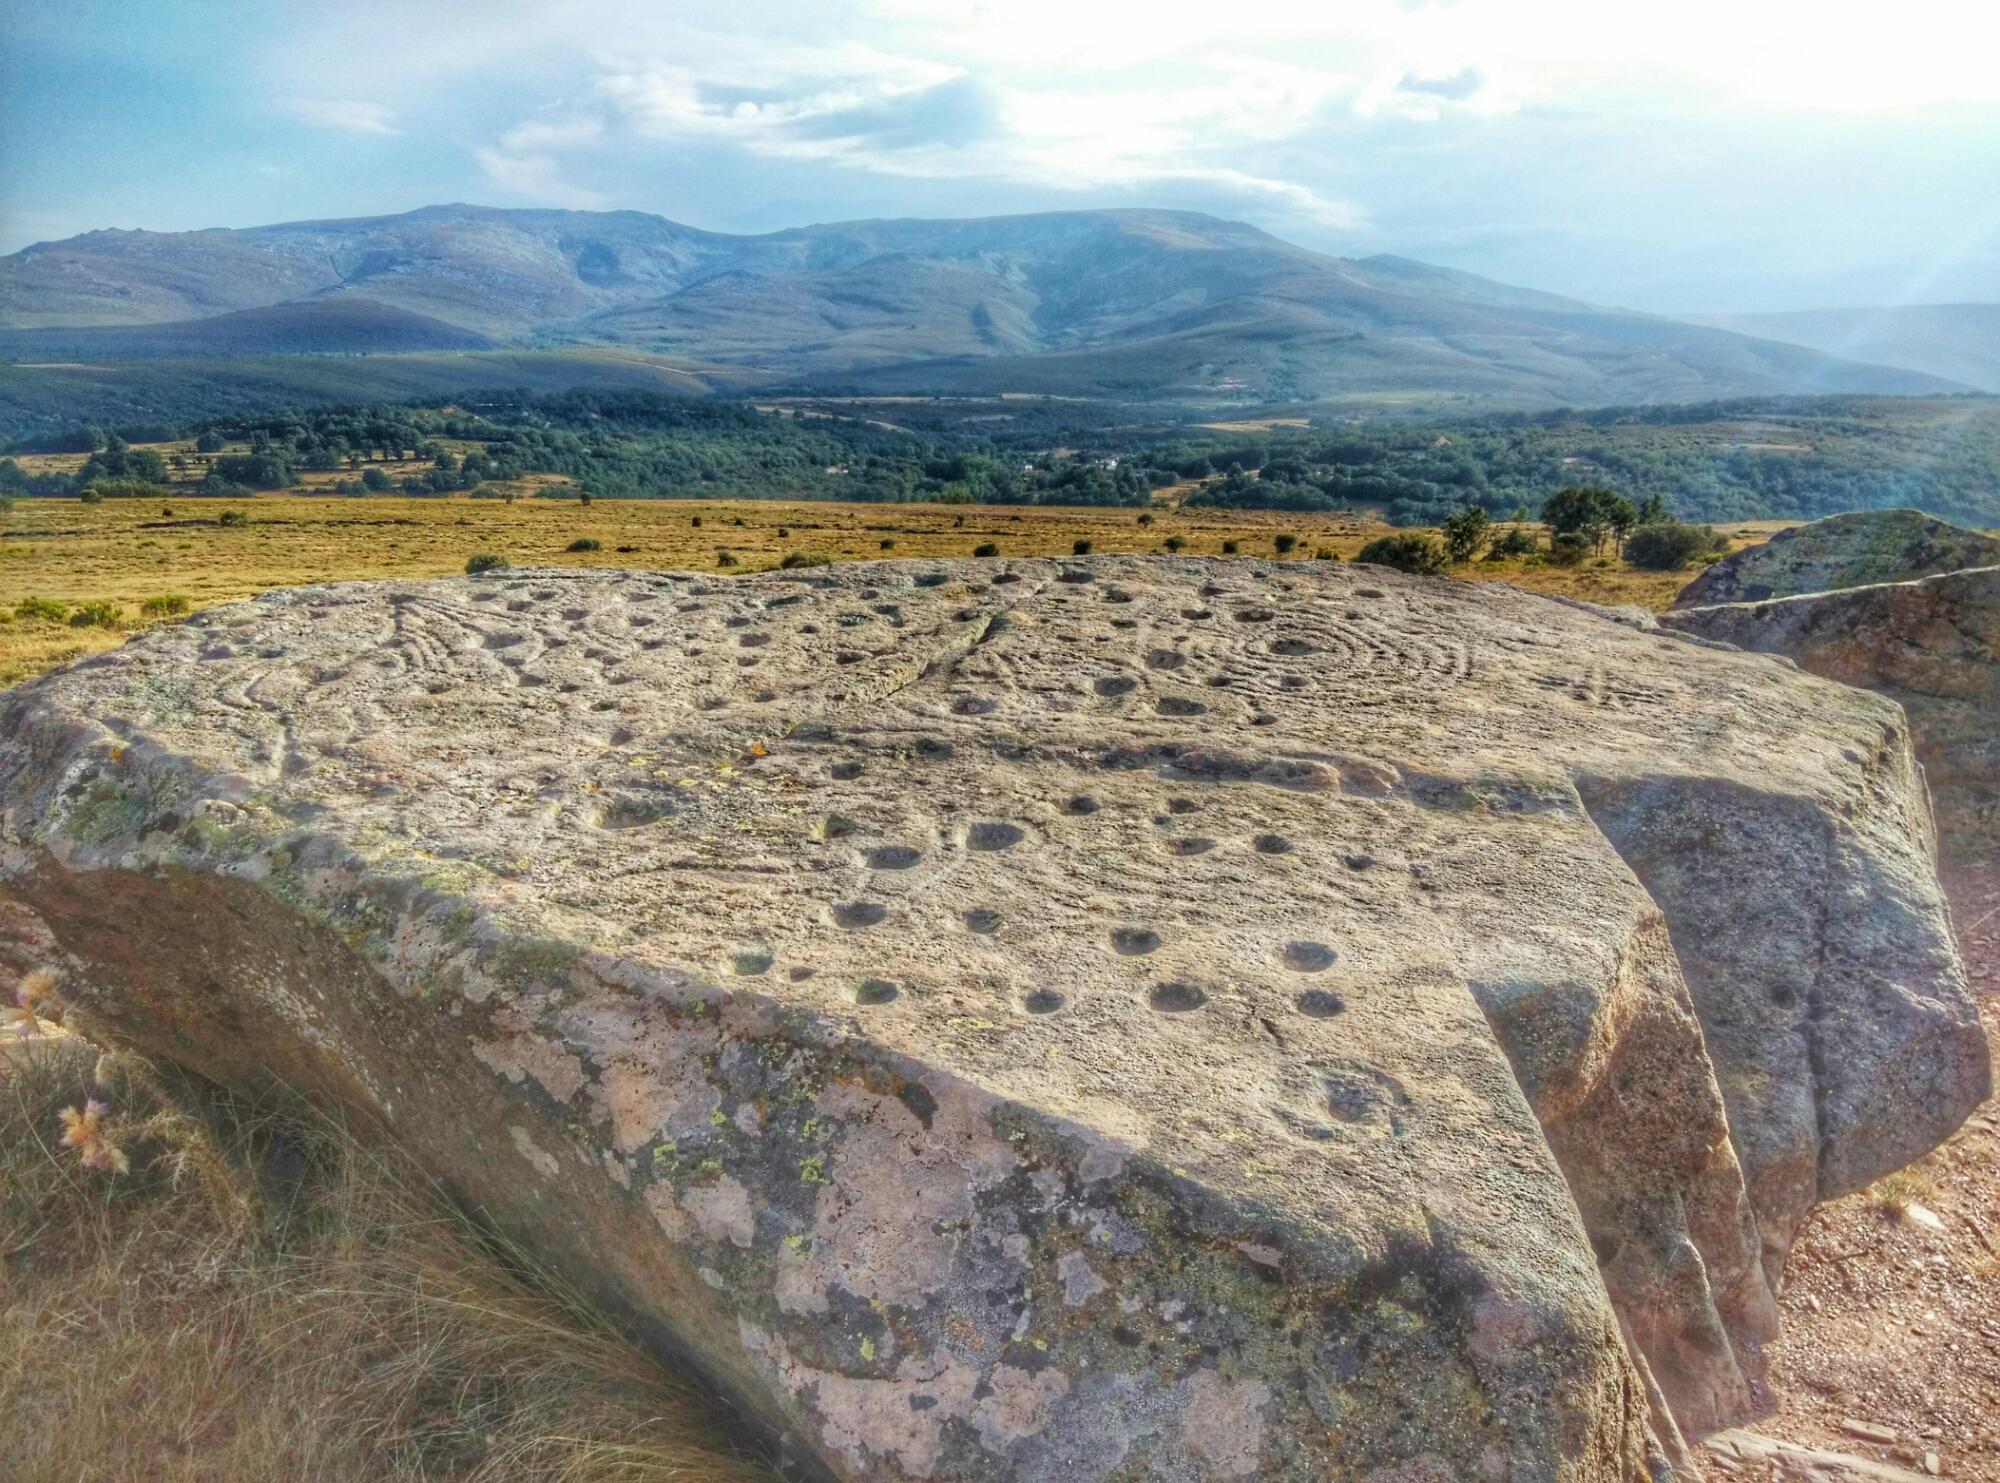 Petroglifos a los pies del Teleno